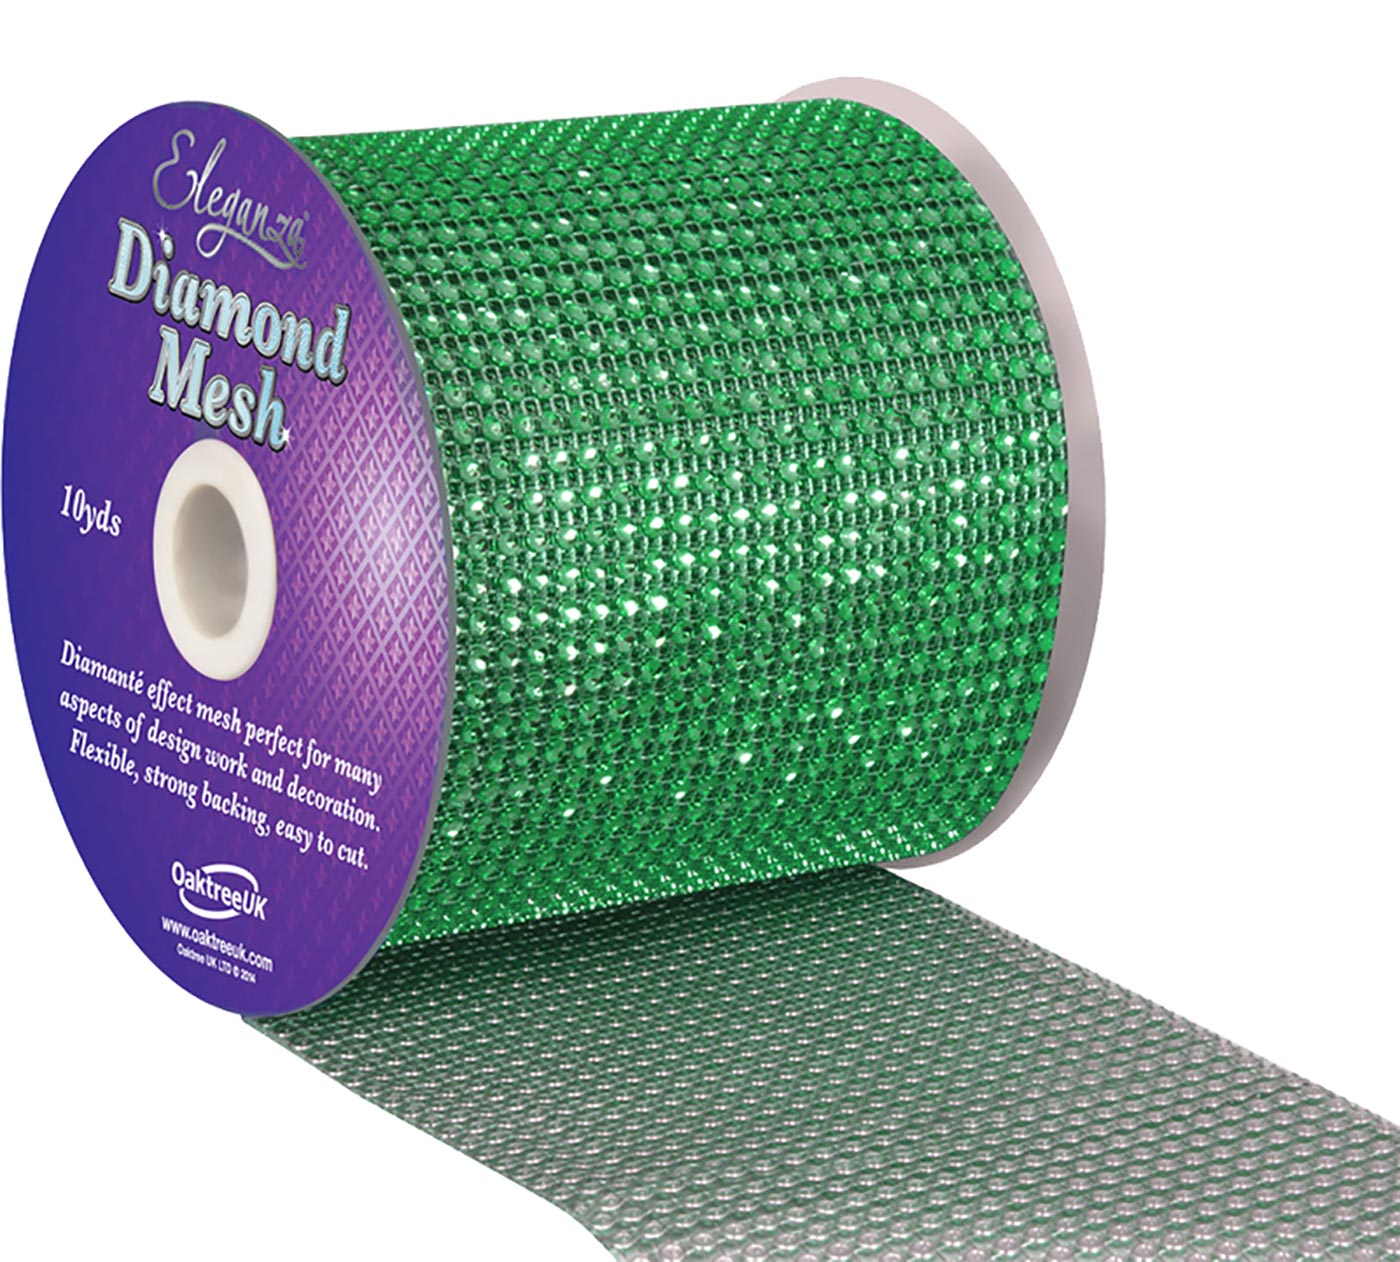 Eleganza Diamond Mesh 12cm x 9m Green